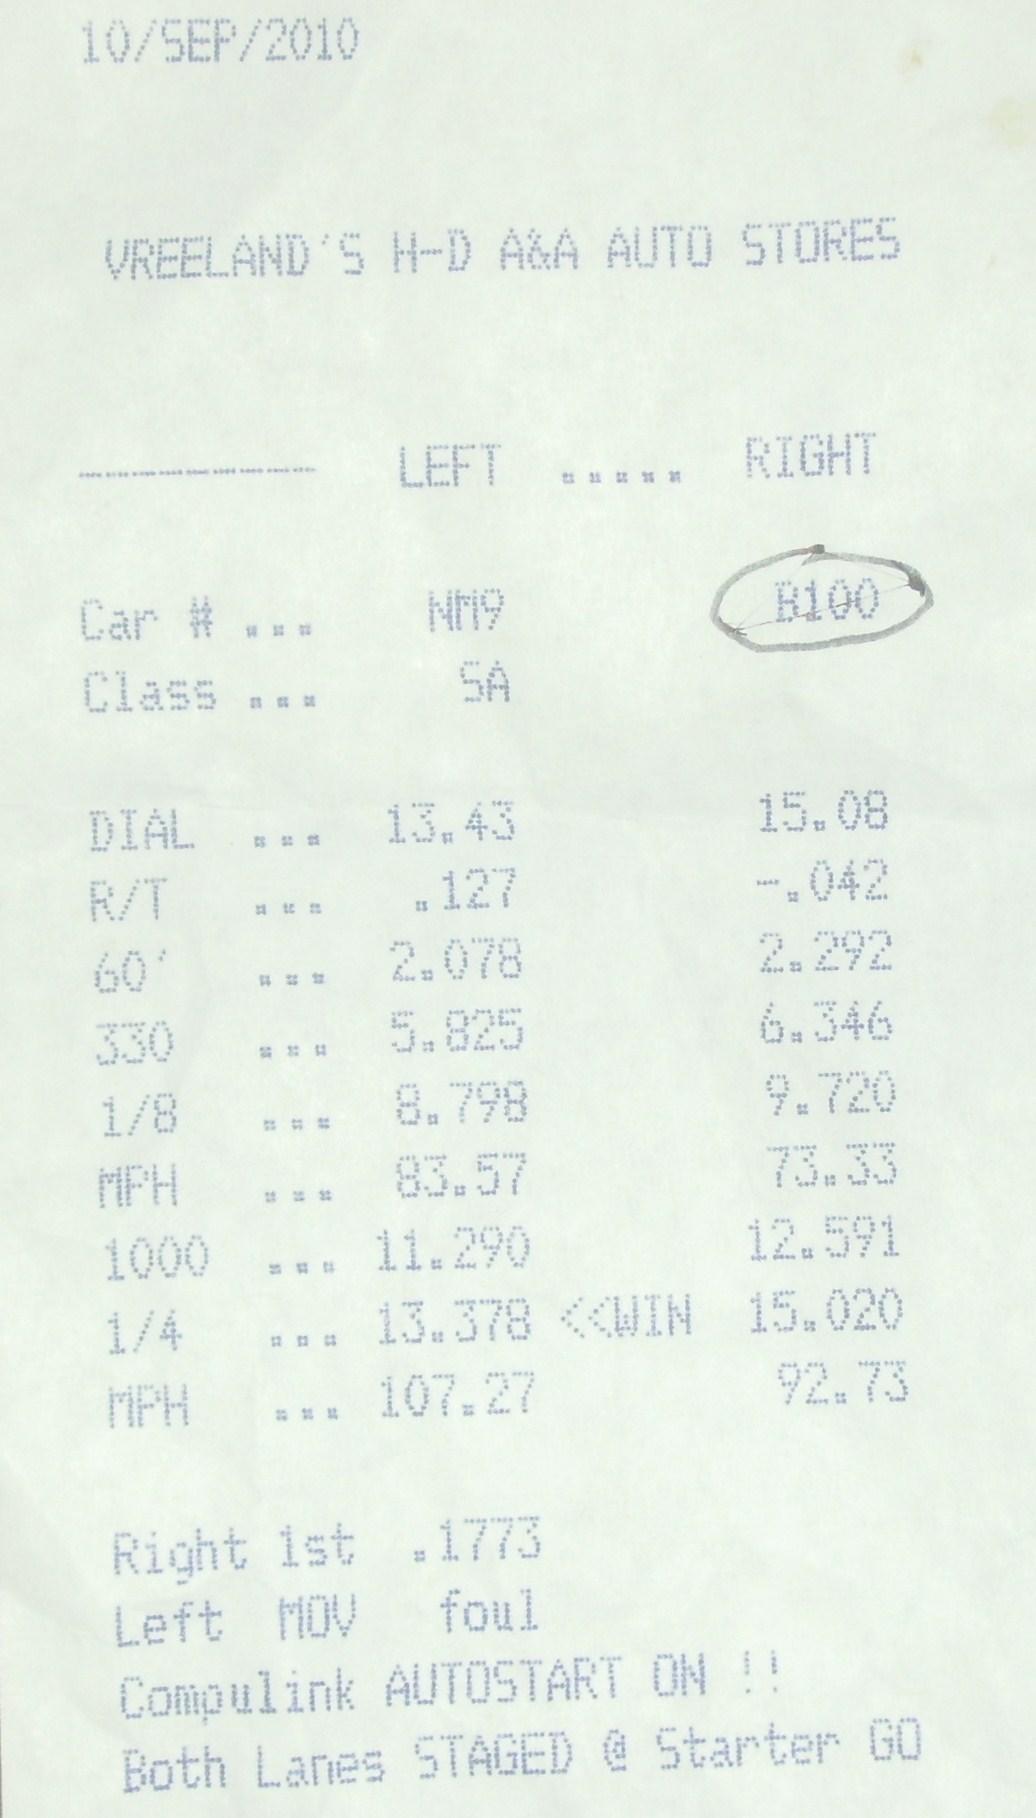 Dodge Ram Sport Crew Cab 4x4 Hemi 1 4 Mile